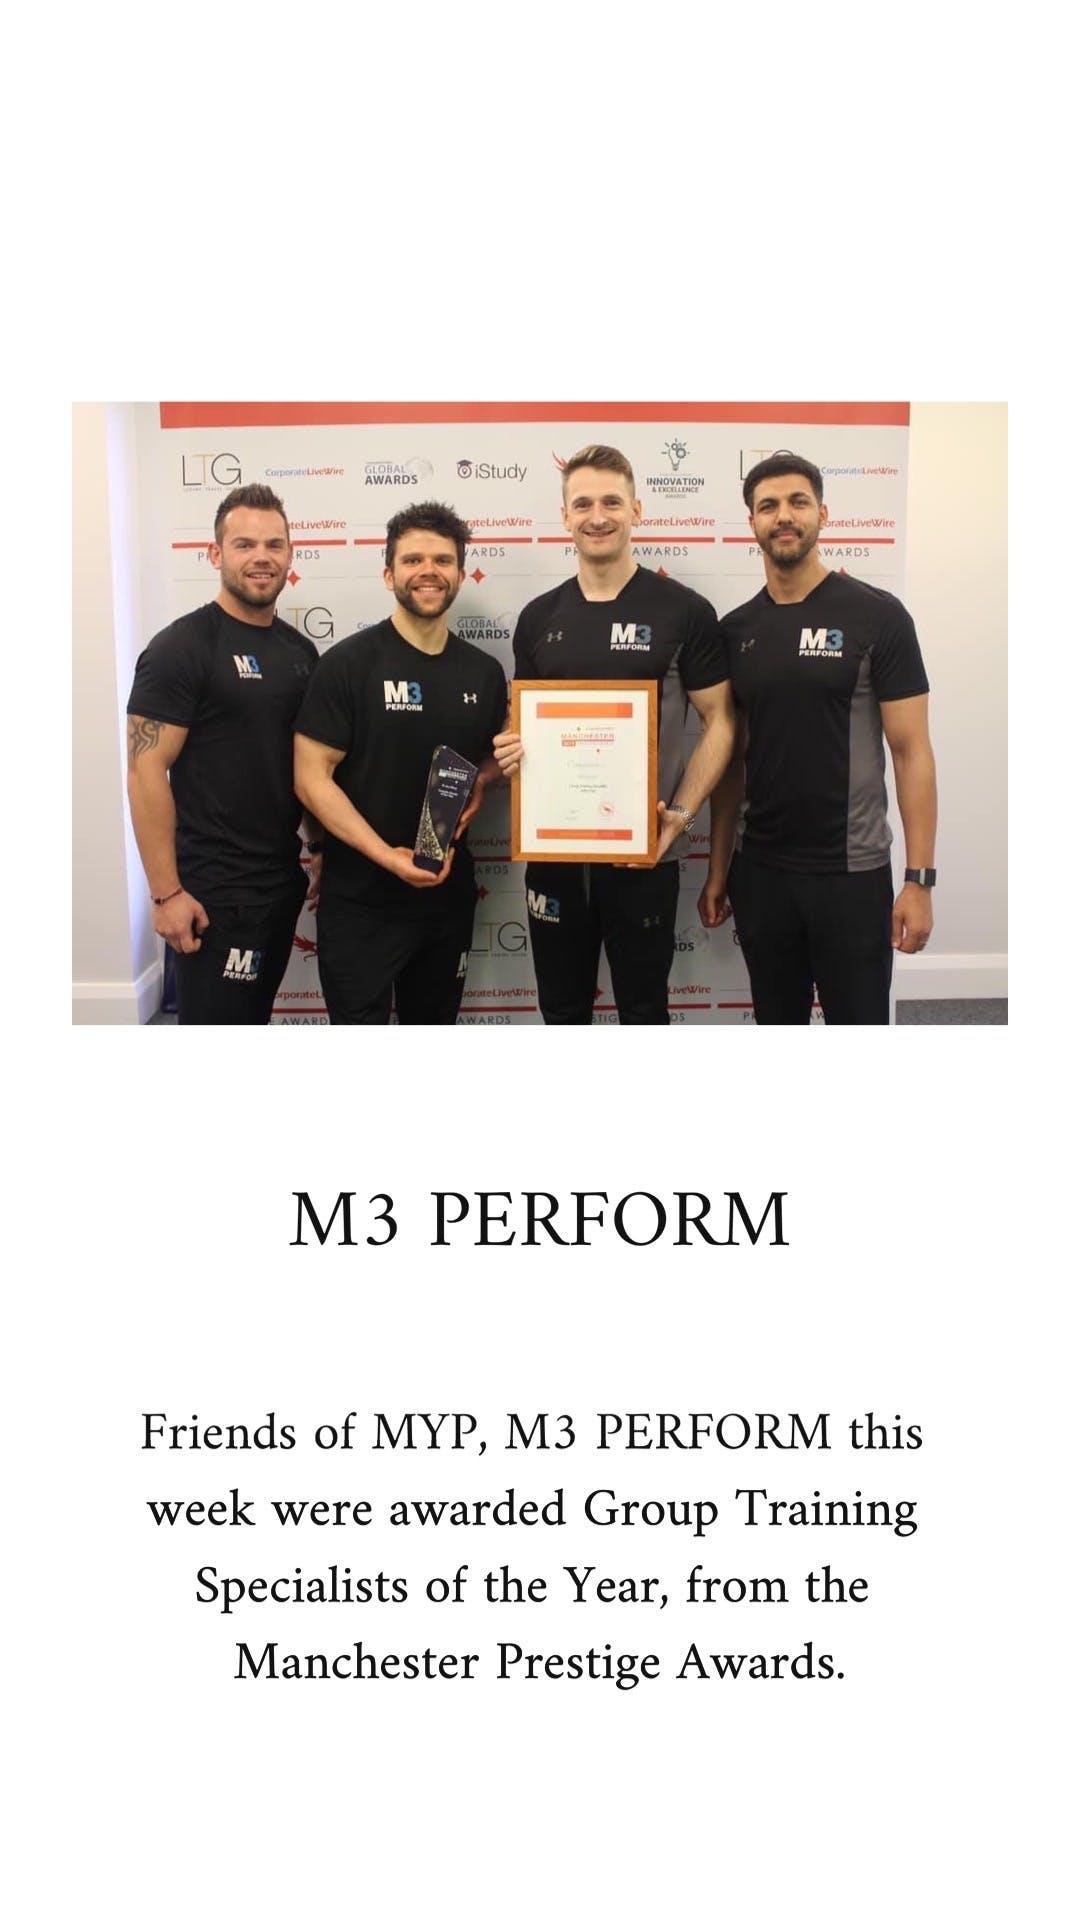 M3 perform bio